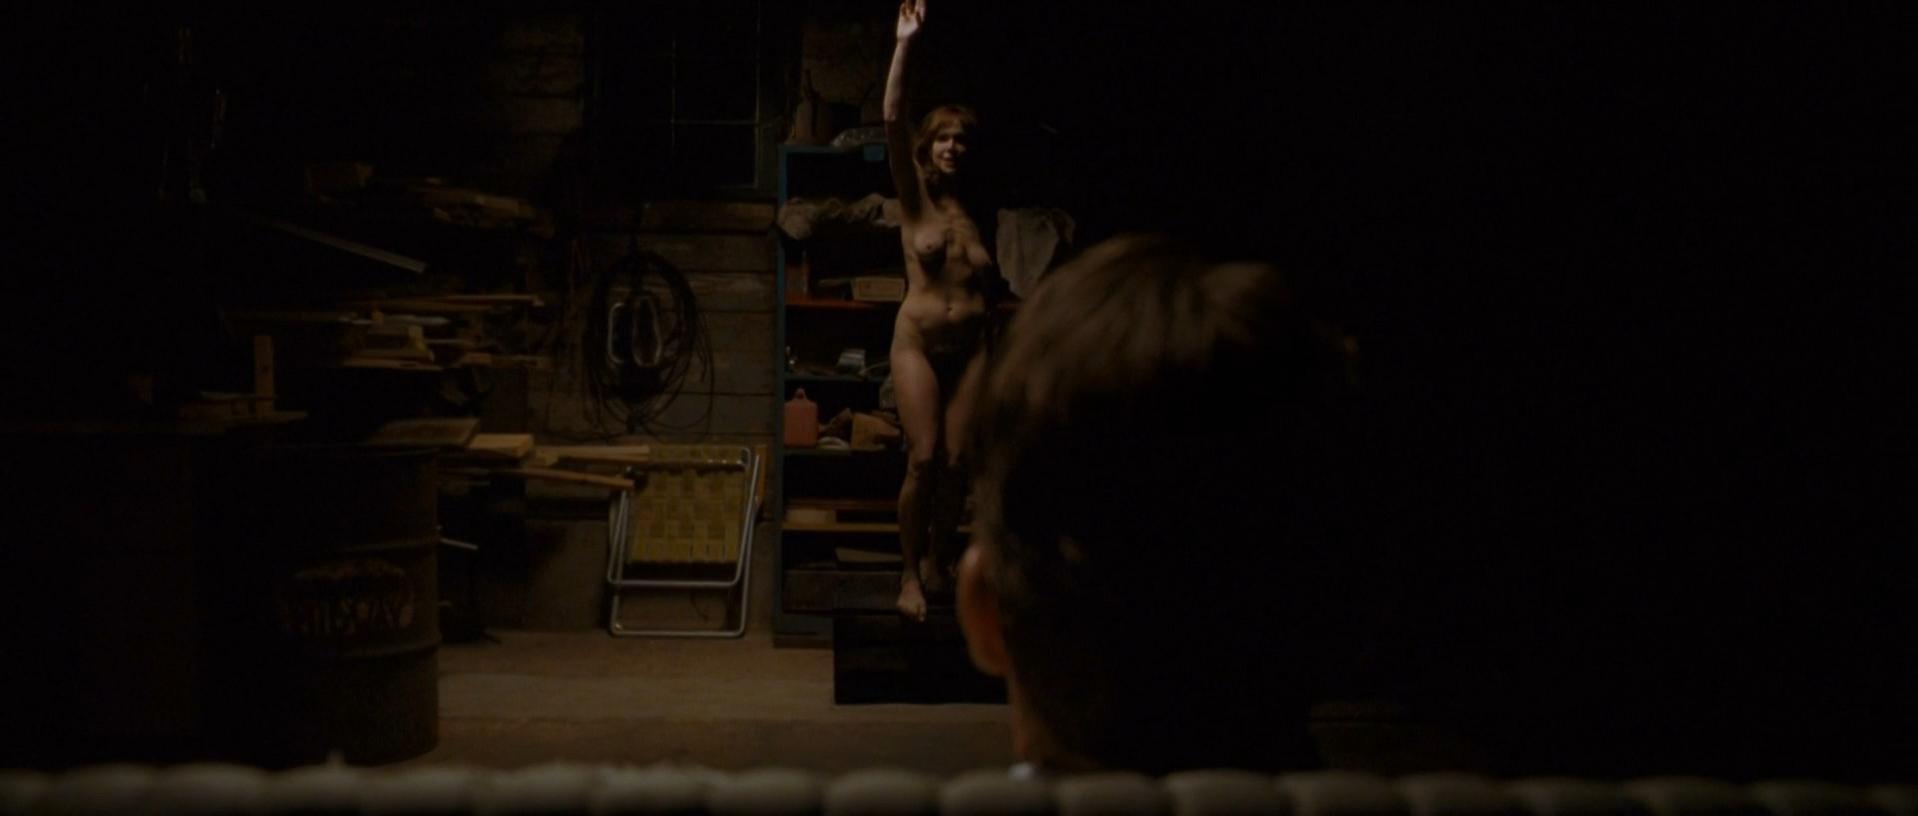 Fake nude frances oconnor